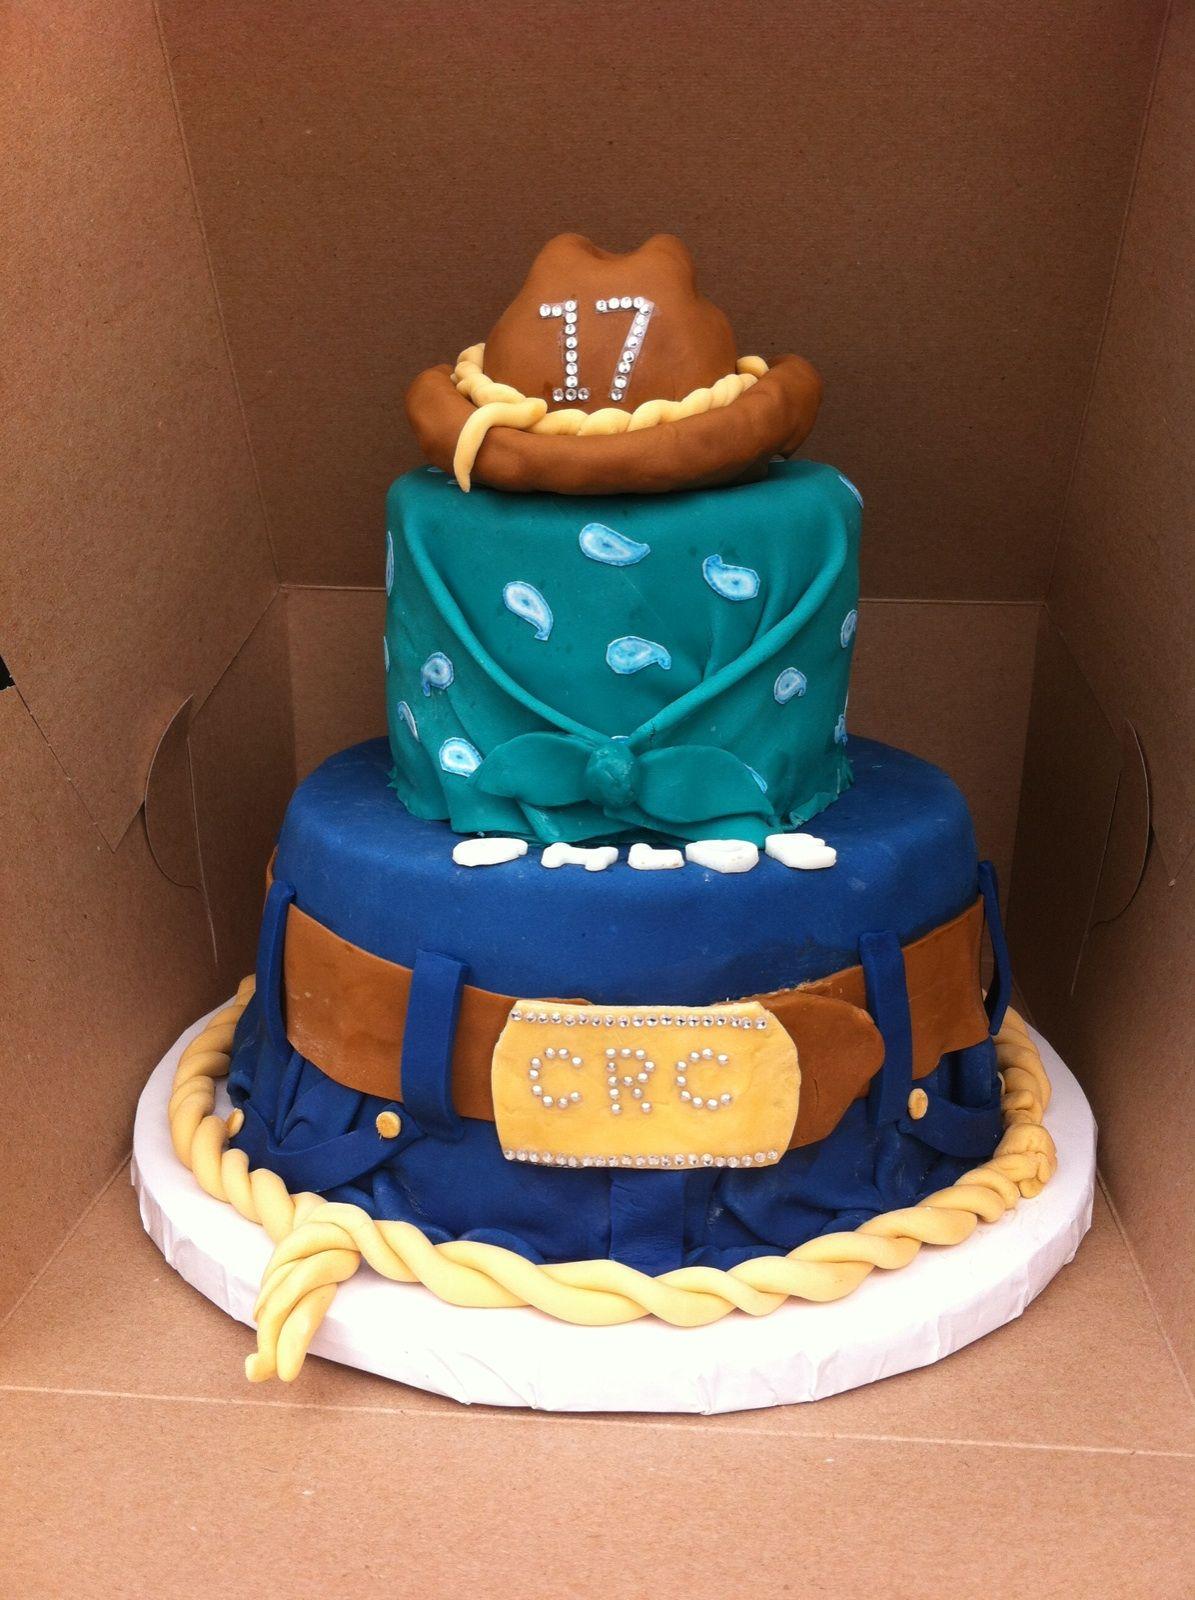 Chloe 17th bday cake | Cake, 17th birthday gifts, Cake ...